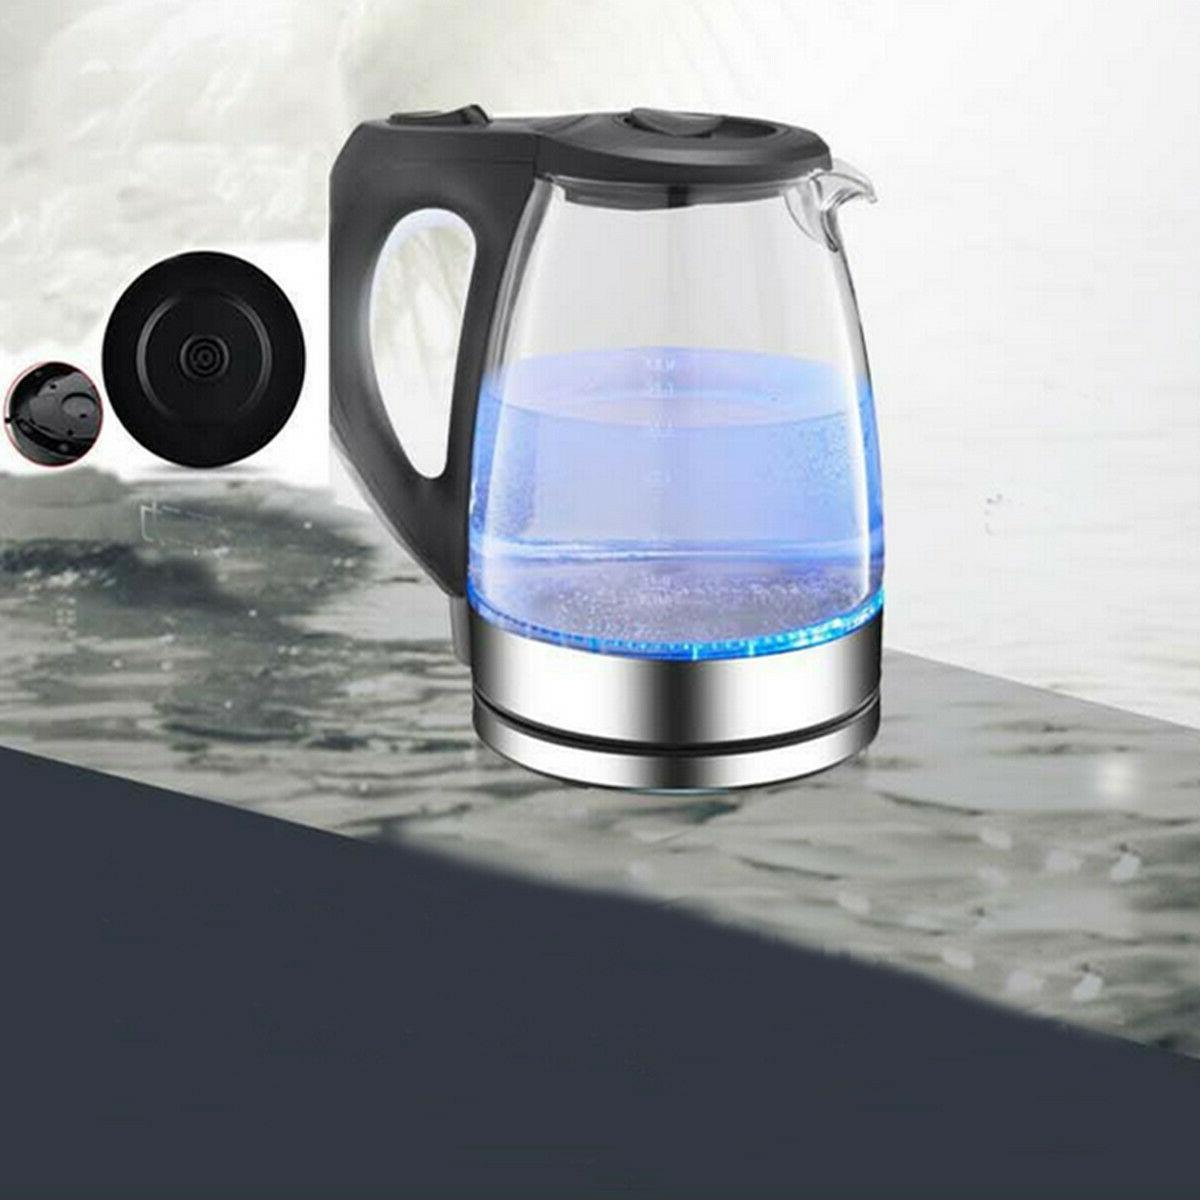 New Tea Makers Water Boil Pot Glass Light 1.7L